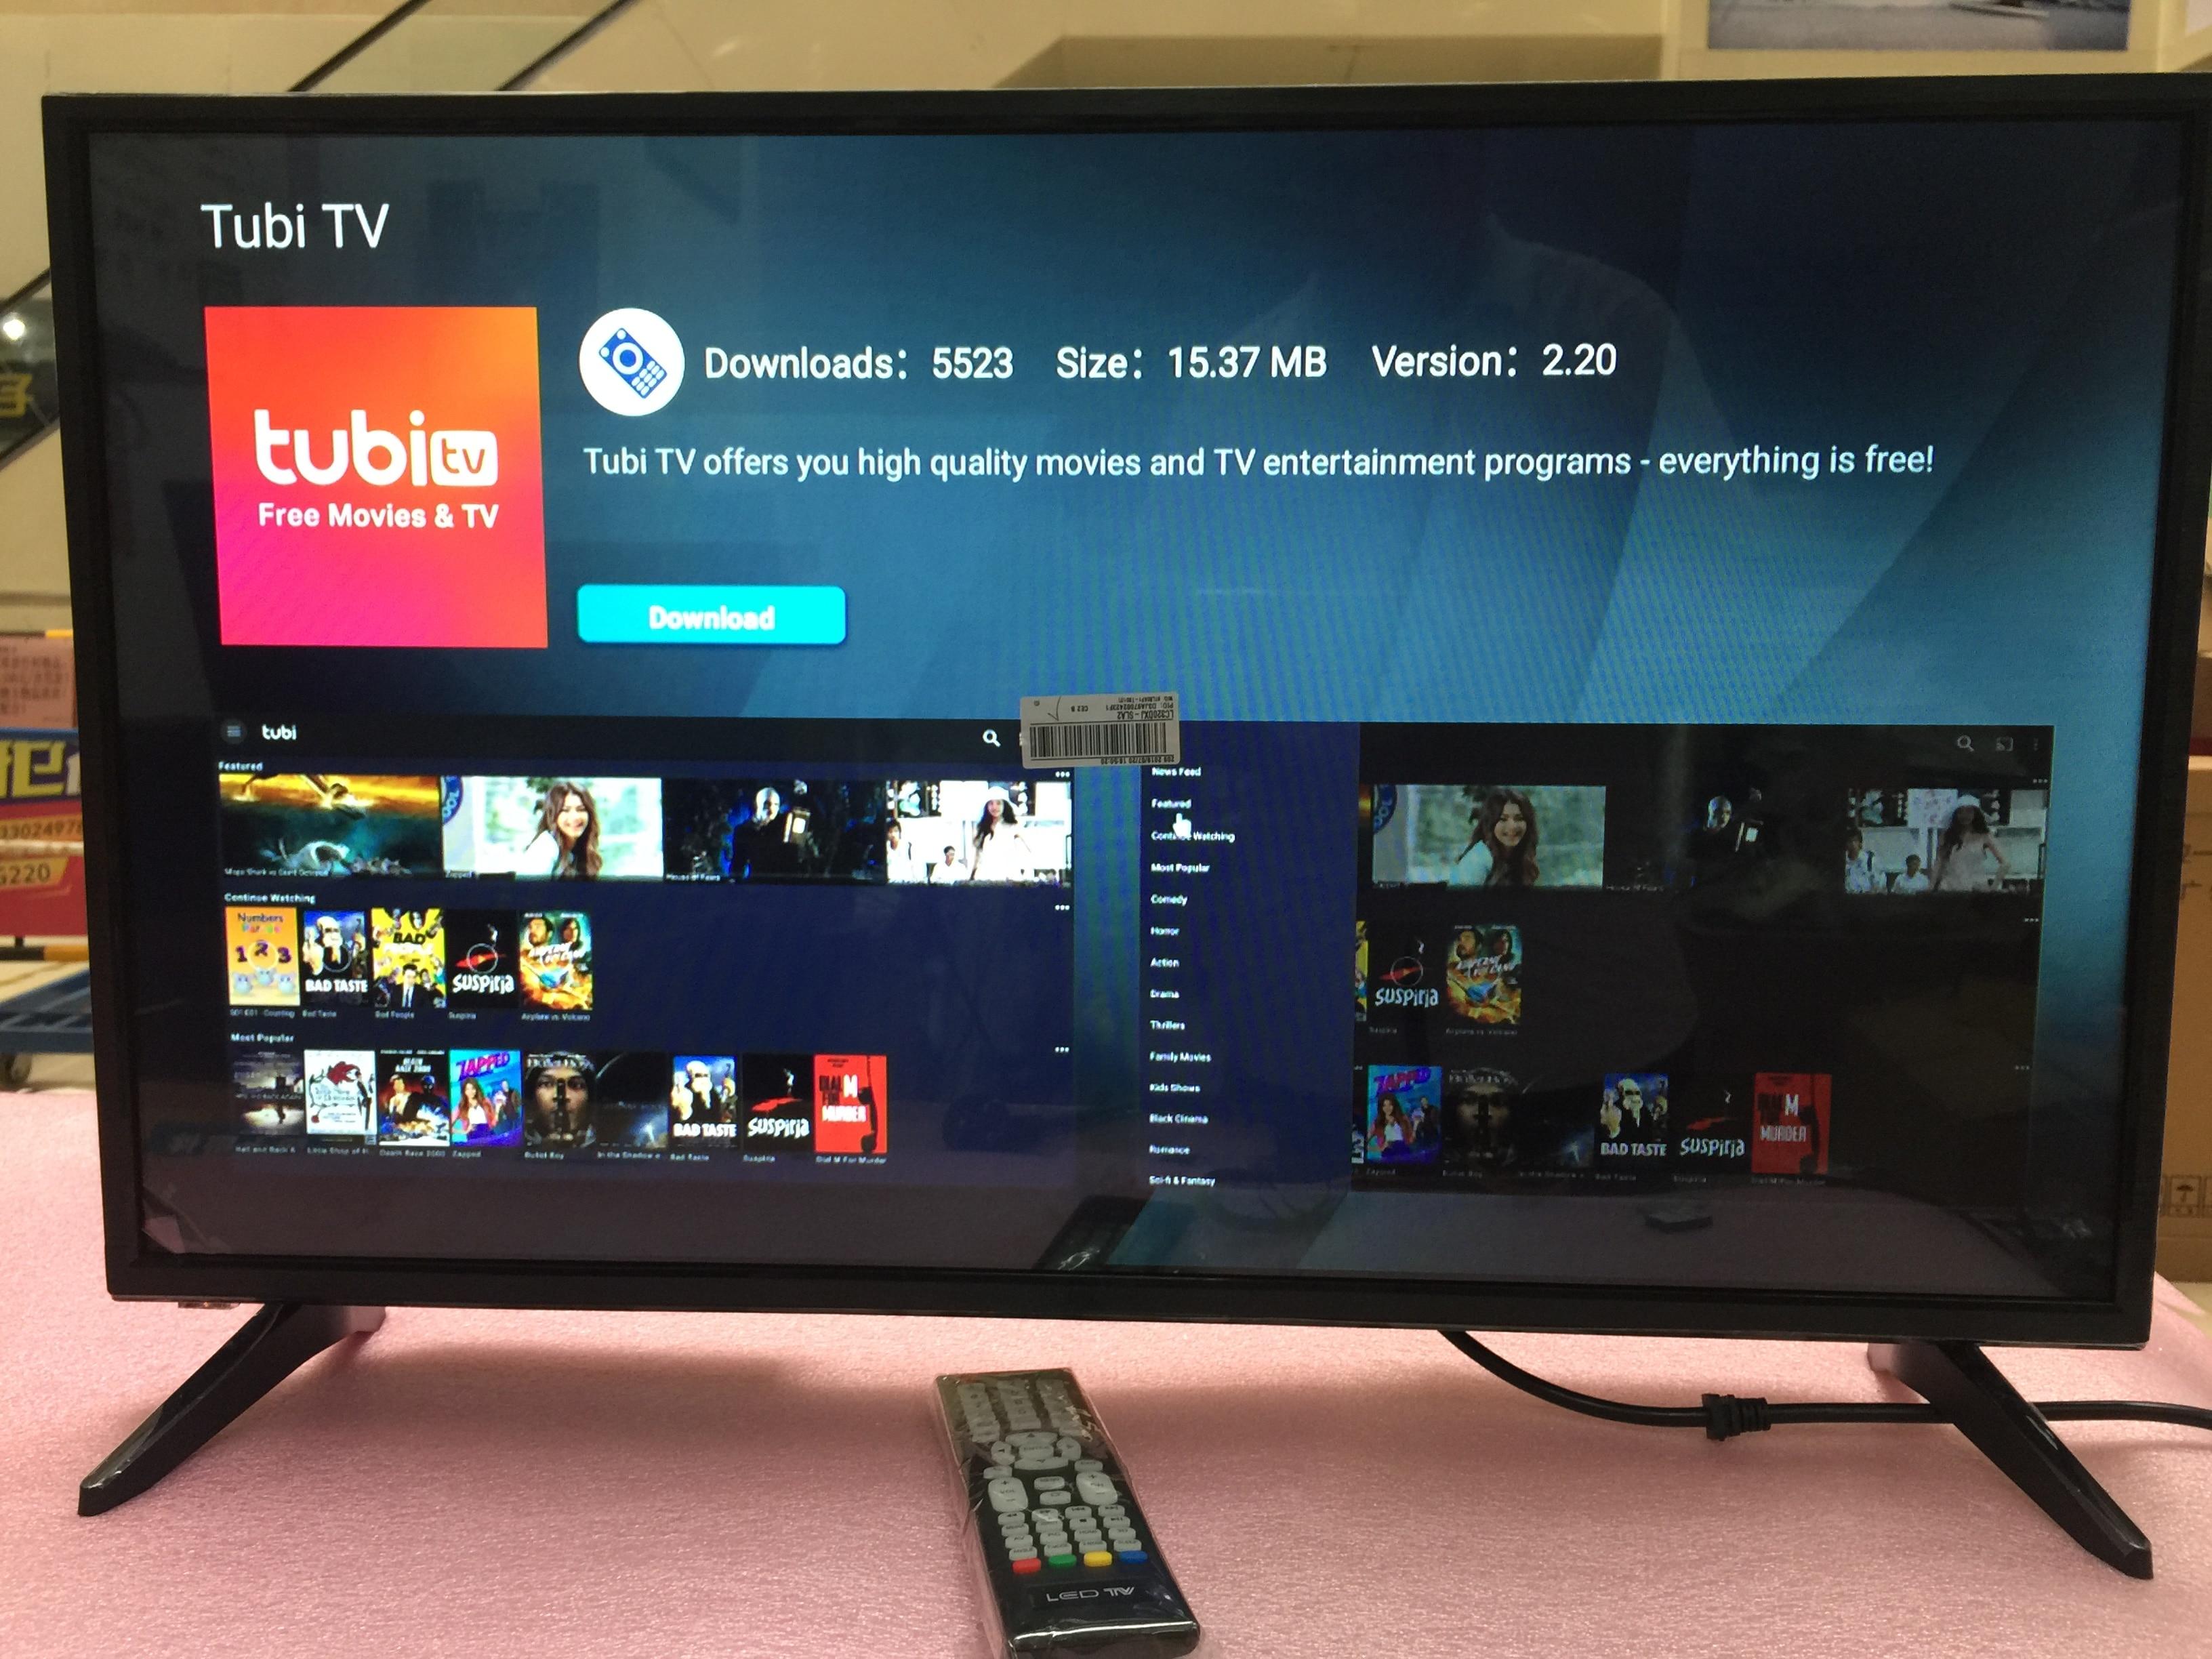 Monitor hd 32 polegadas + wifi smart android 7.1.1 ram 1gb rom 4gb internet led tv